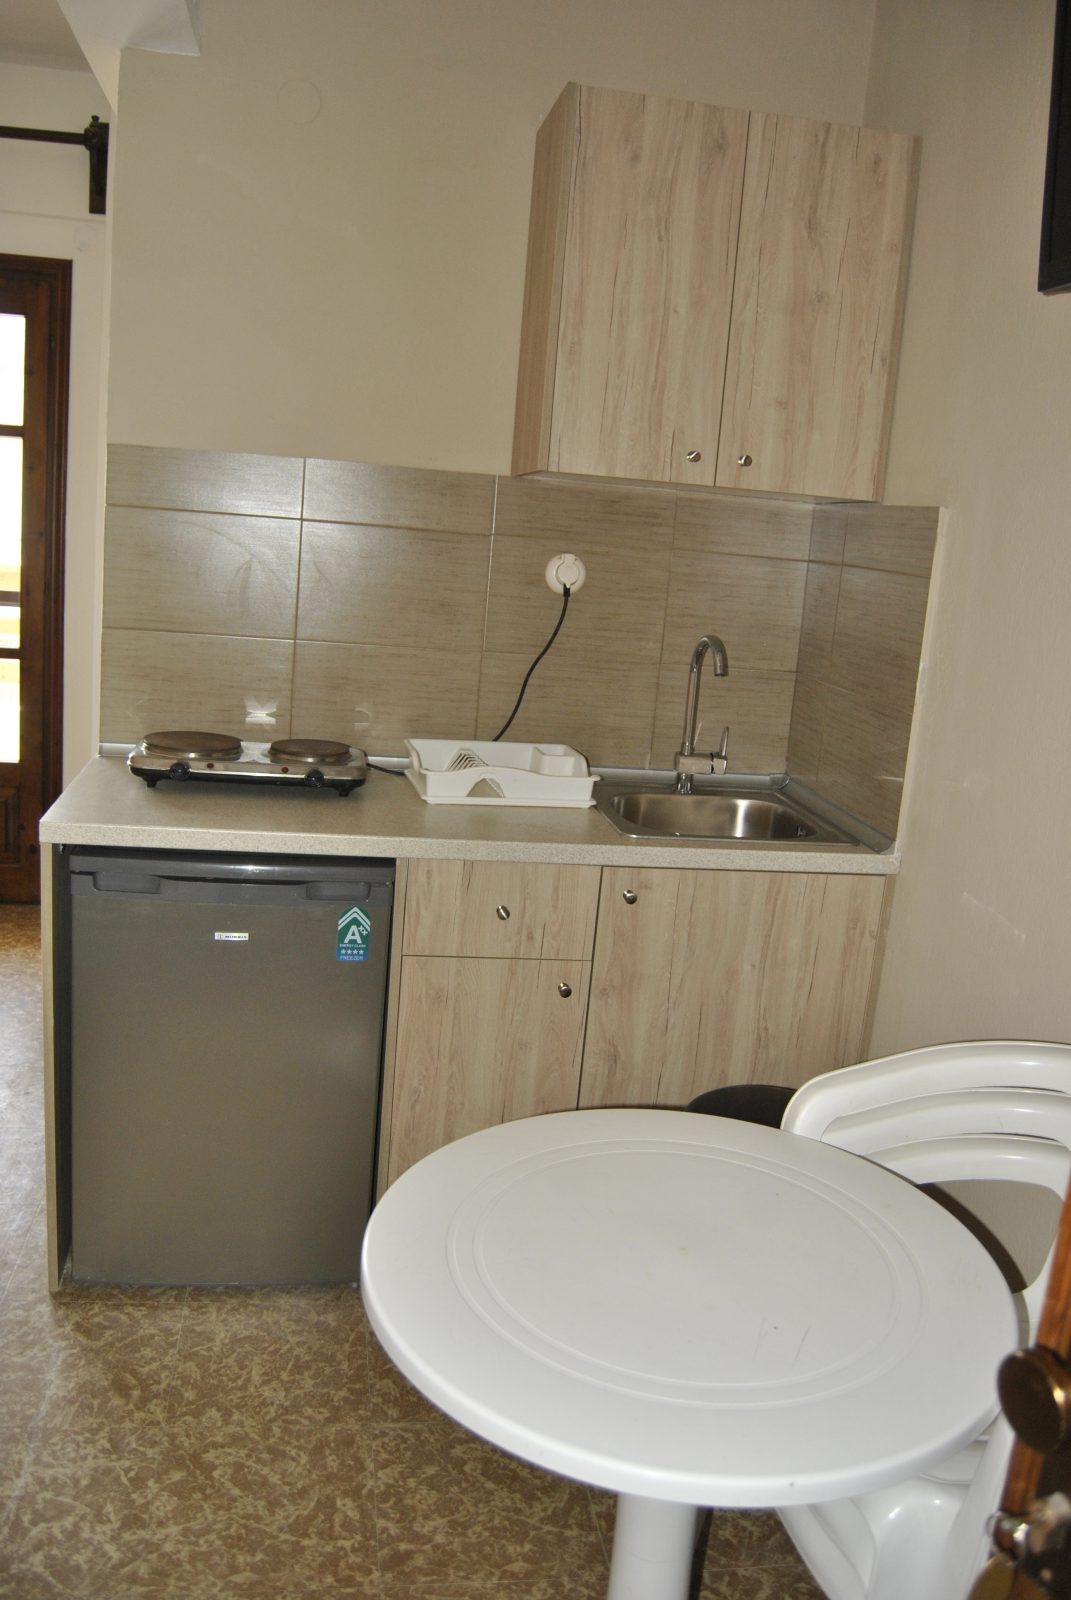 Grcka apartmani letovanje, Nea Flogita Halkidiki, Pirgioti, kuhinja studia